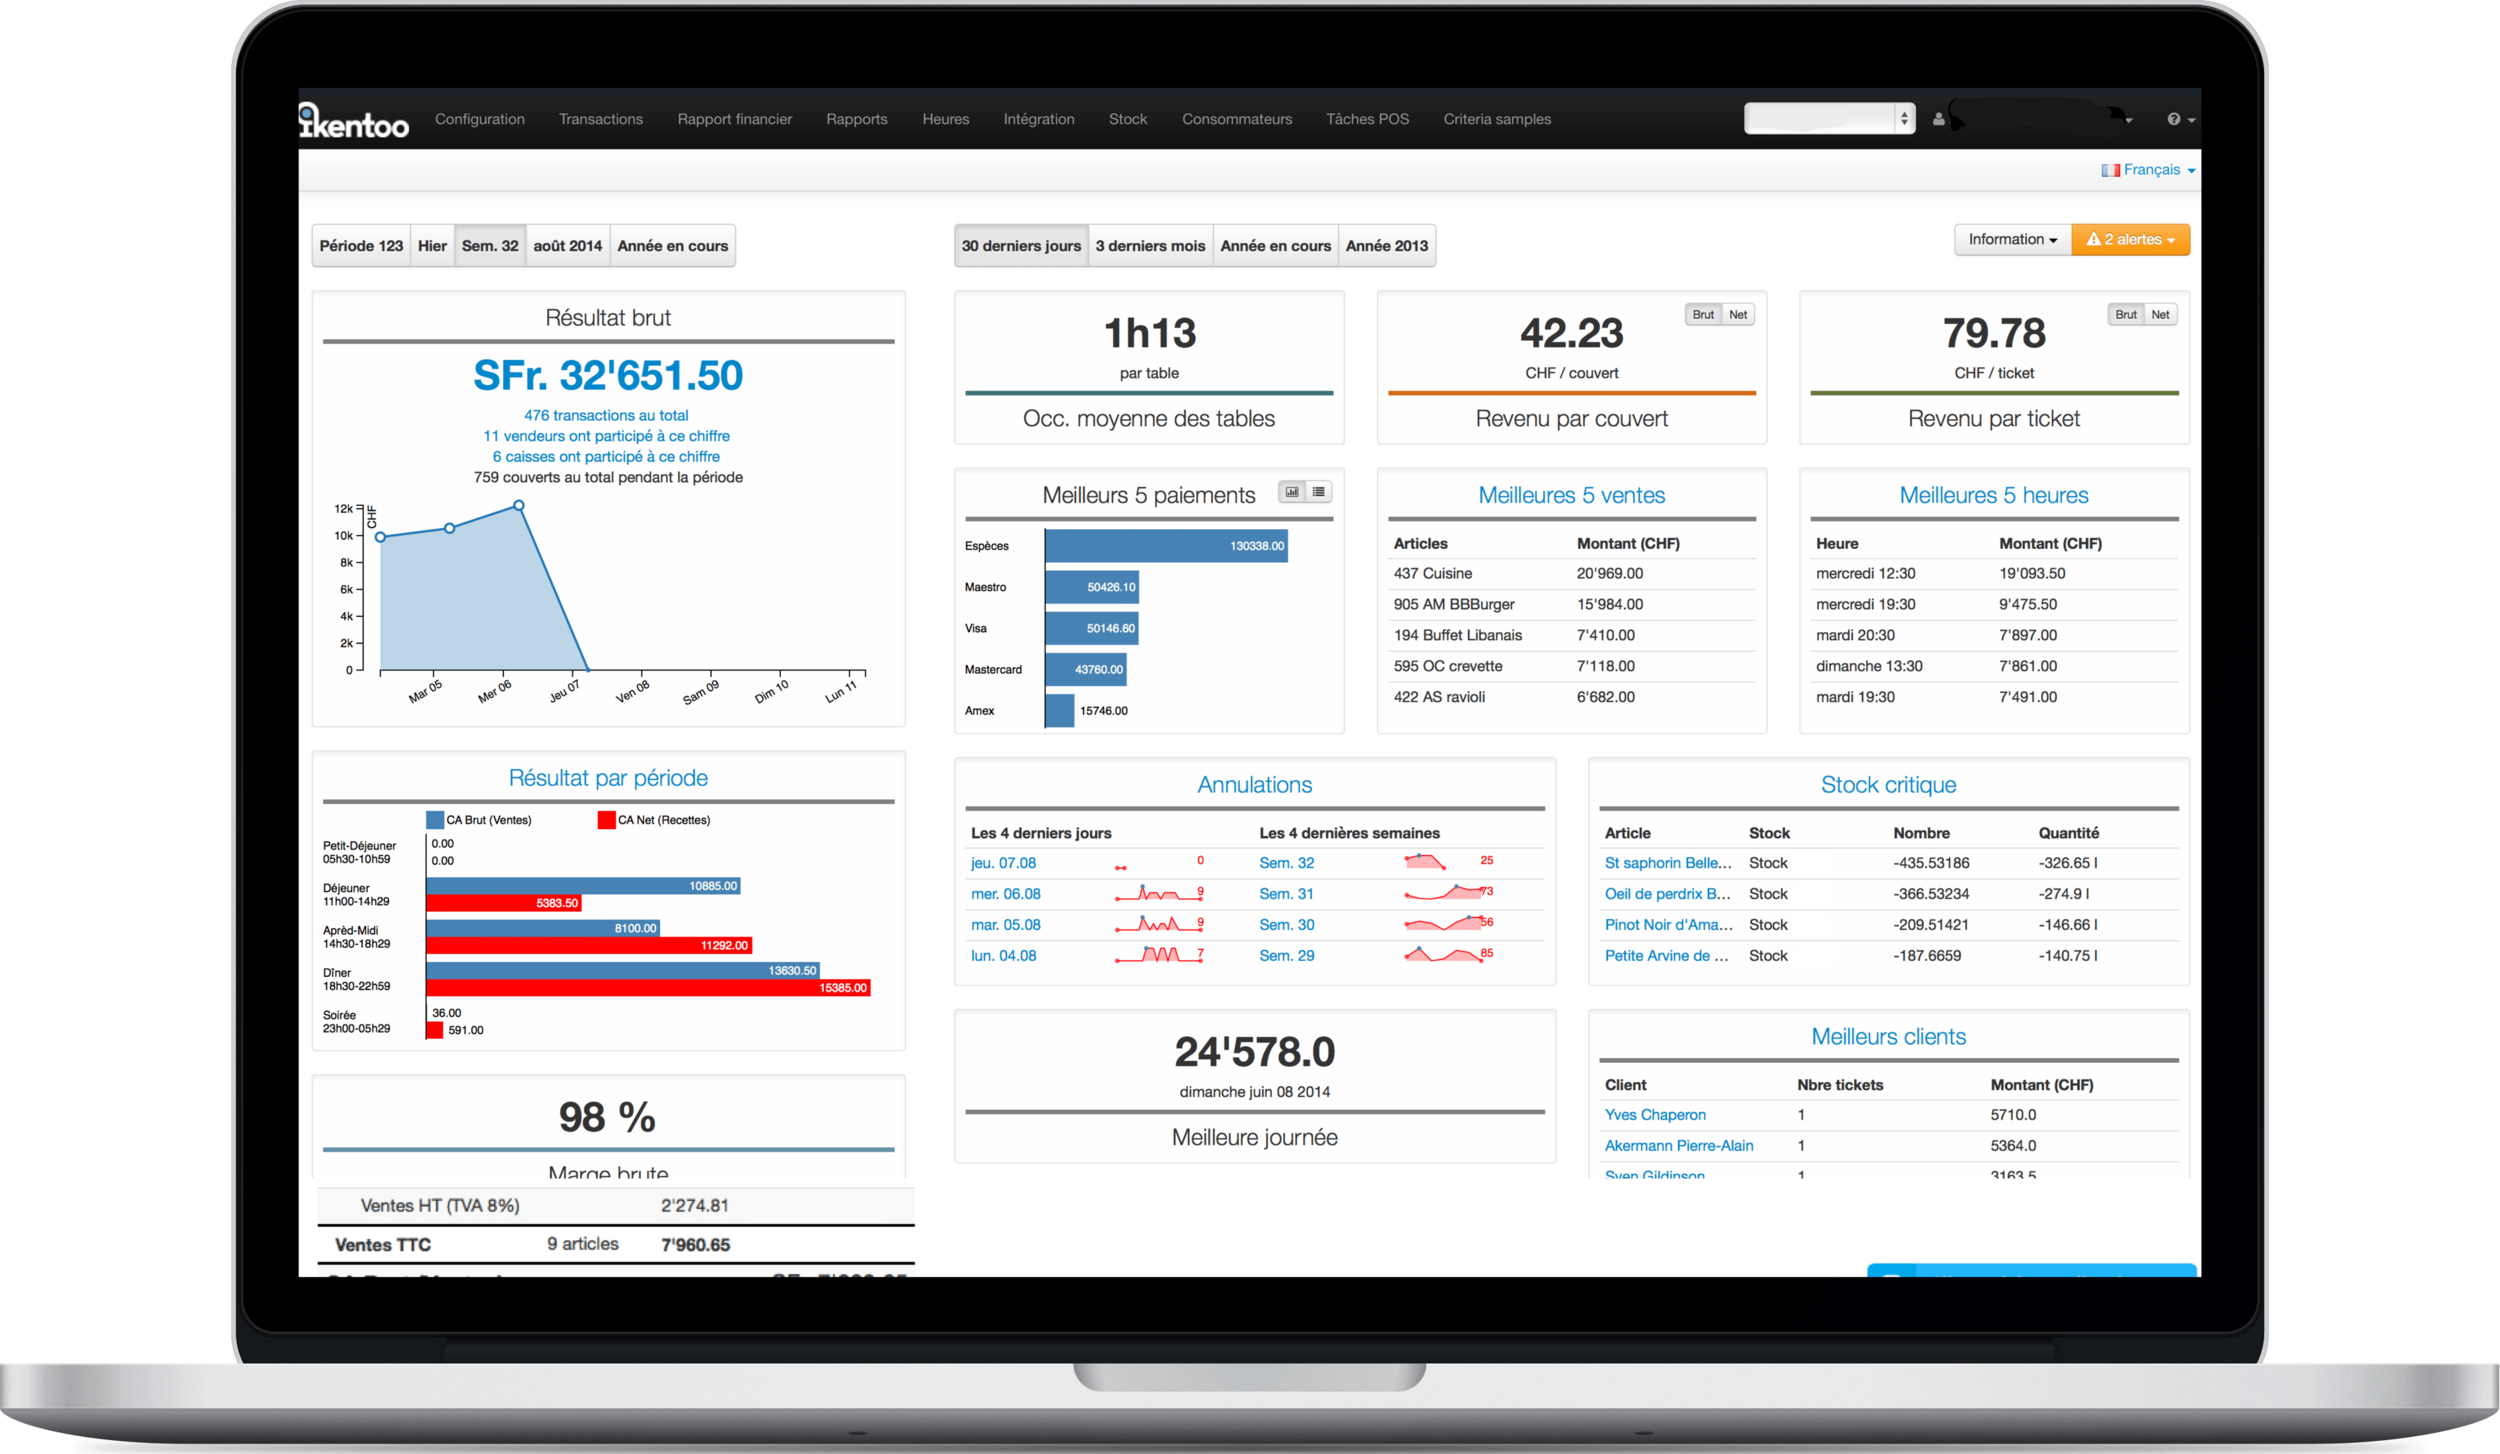 ikentoo-back-office-management-platform-financial-reporting-configuration